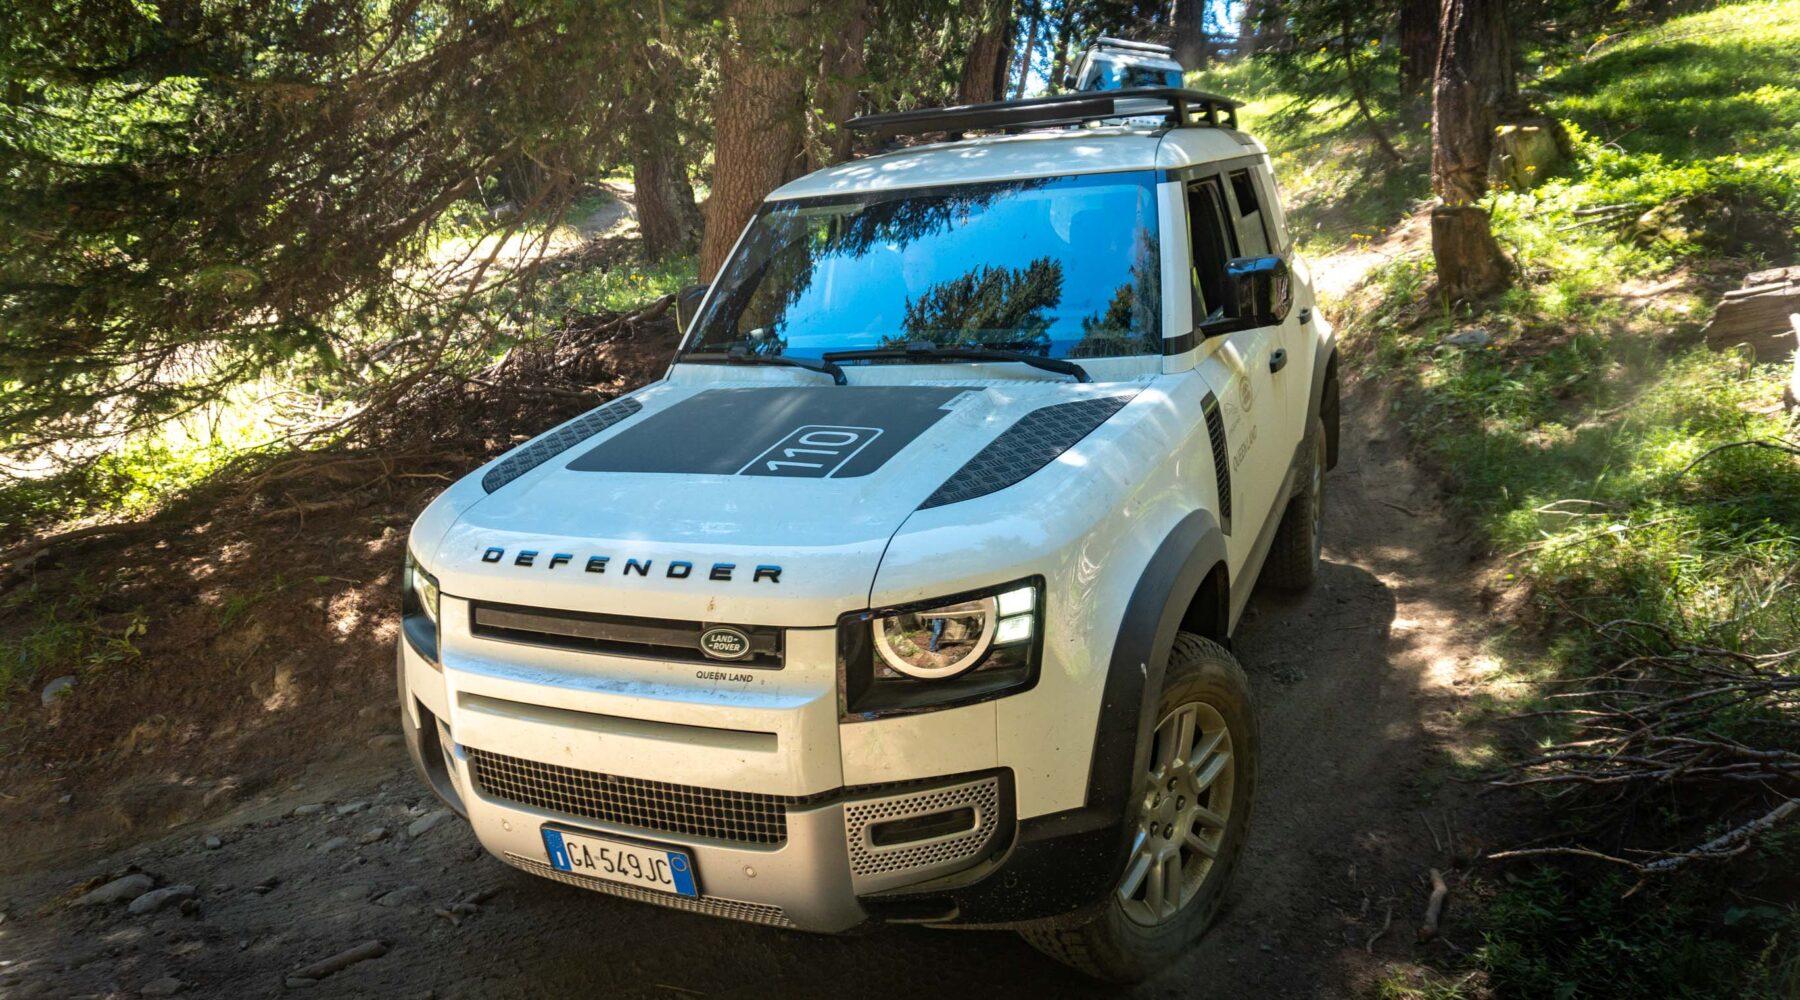 Land-Rover-Day-Valle-dAosta-La-Thuile-02-Land-Rover-Experience-Italia-43-1800x1000